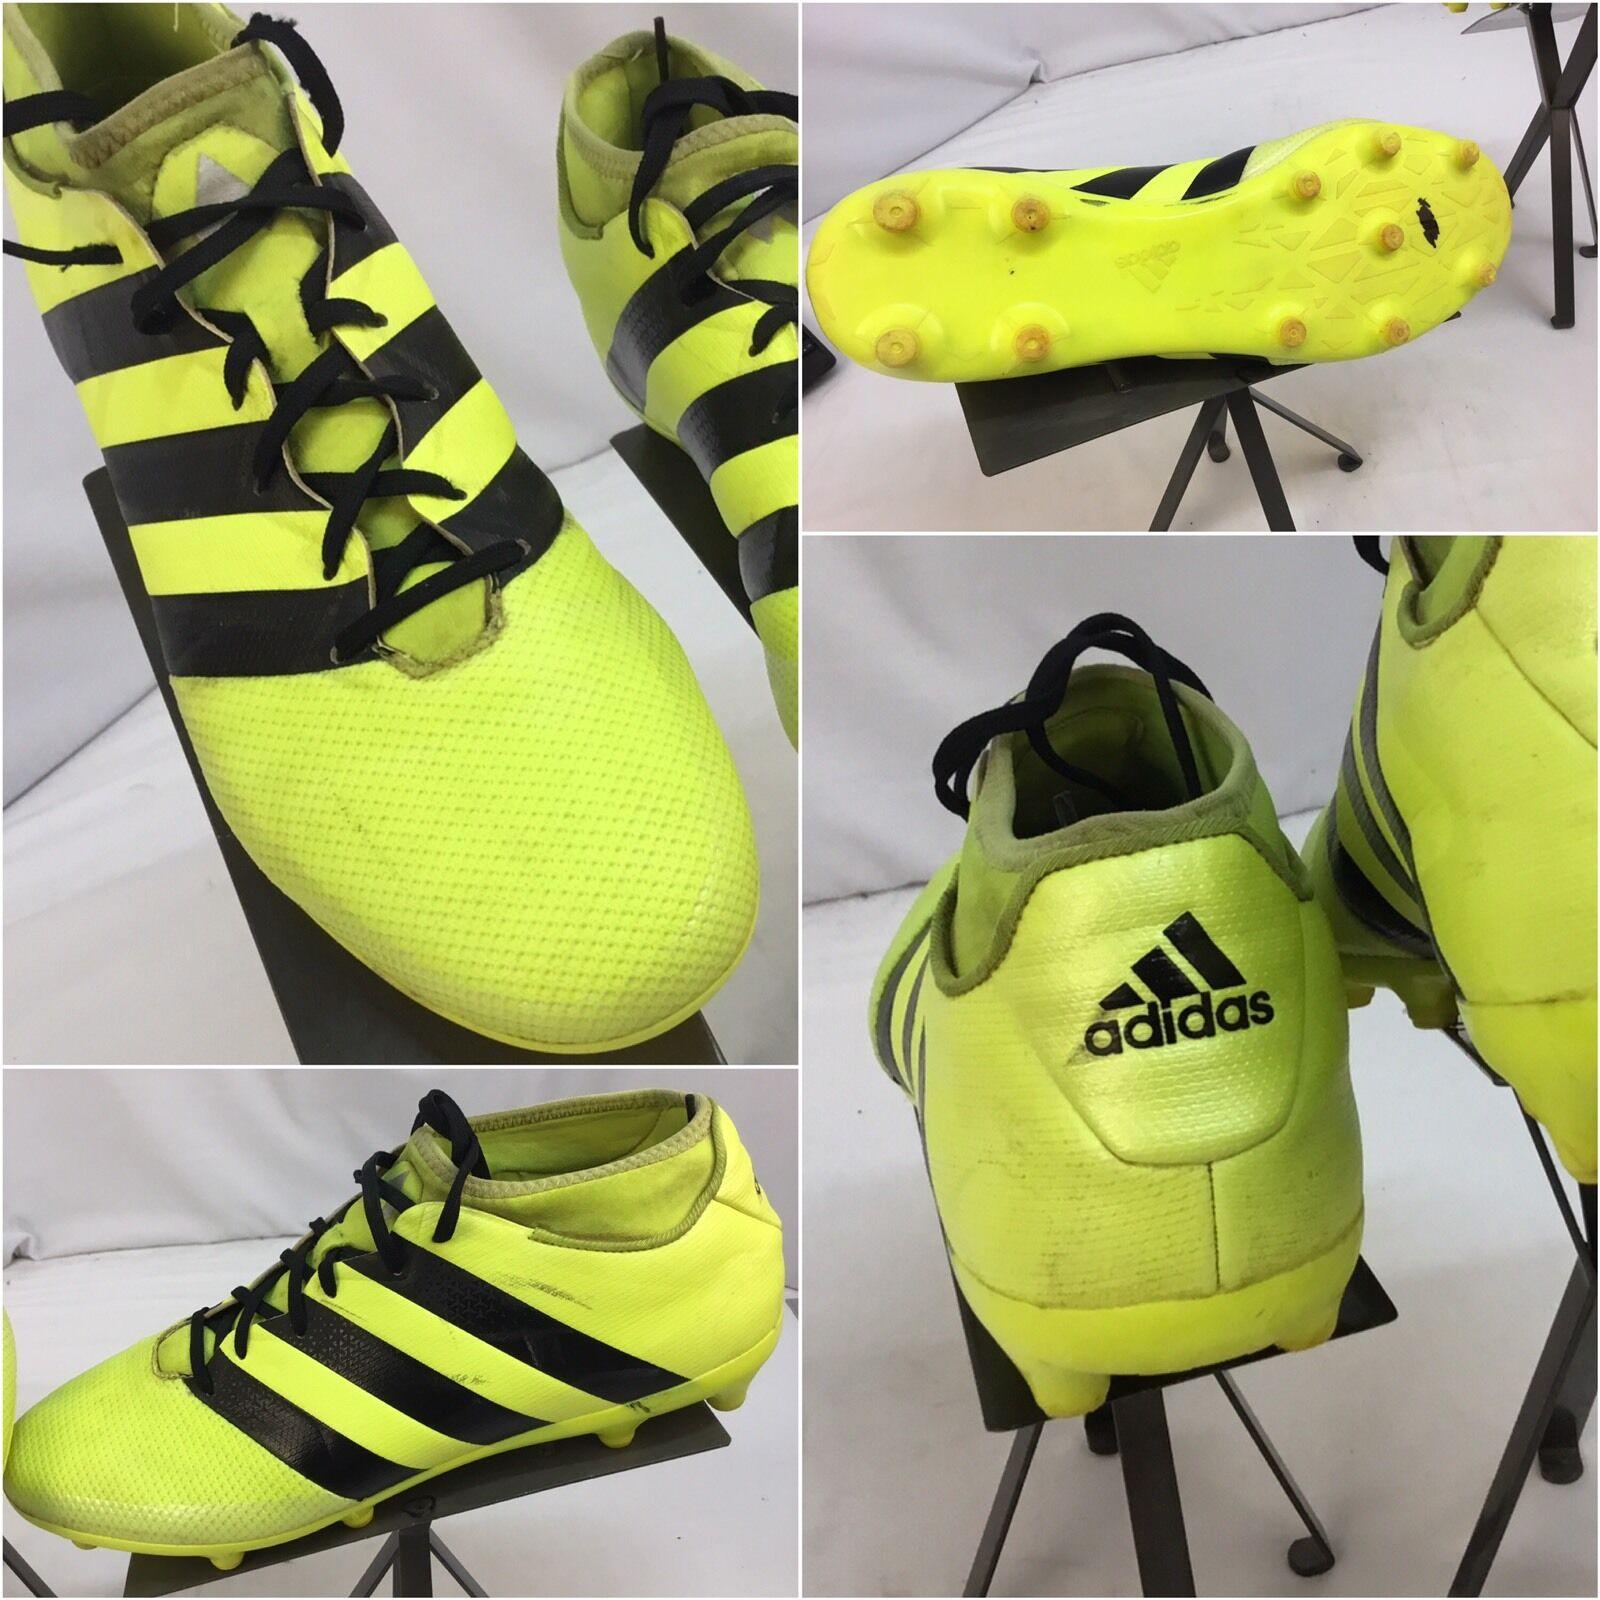 adidas performance as 16,3 sz stollenschuhe 12,5 männer gelben neon stollenschuhe sz euc ygi f7 2773ec